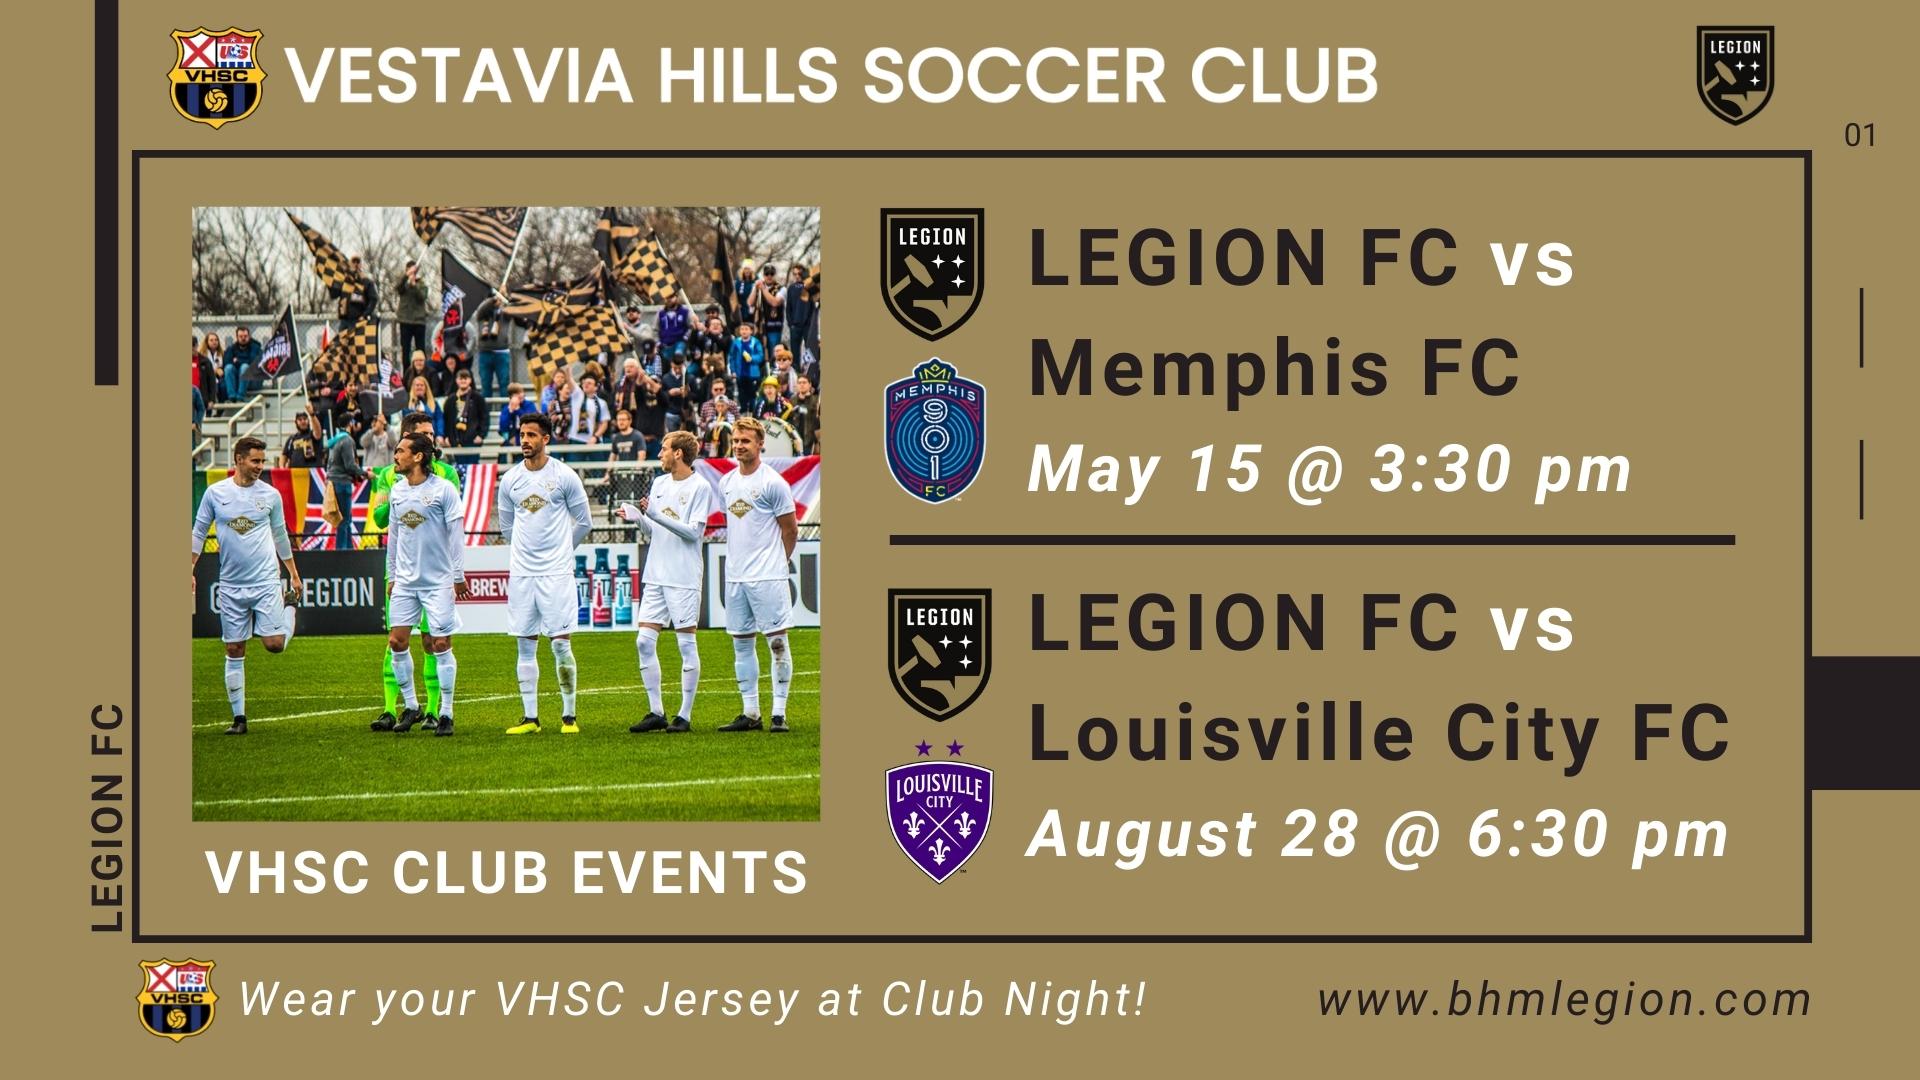 1920x1080 Web Post LEGION FC VHSC Club Events